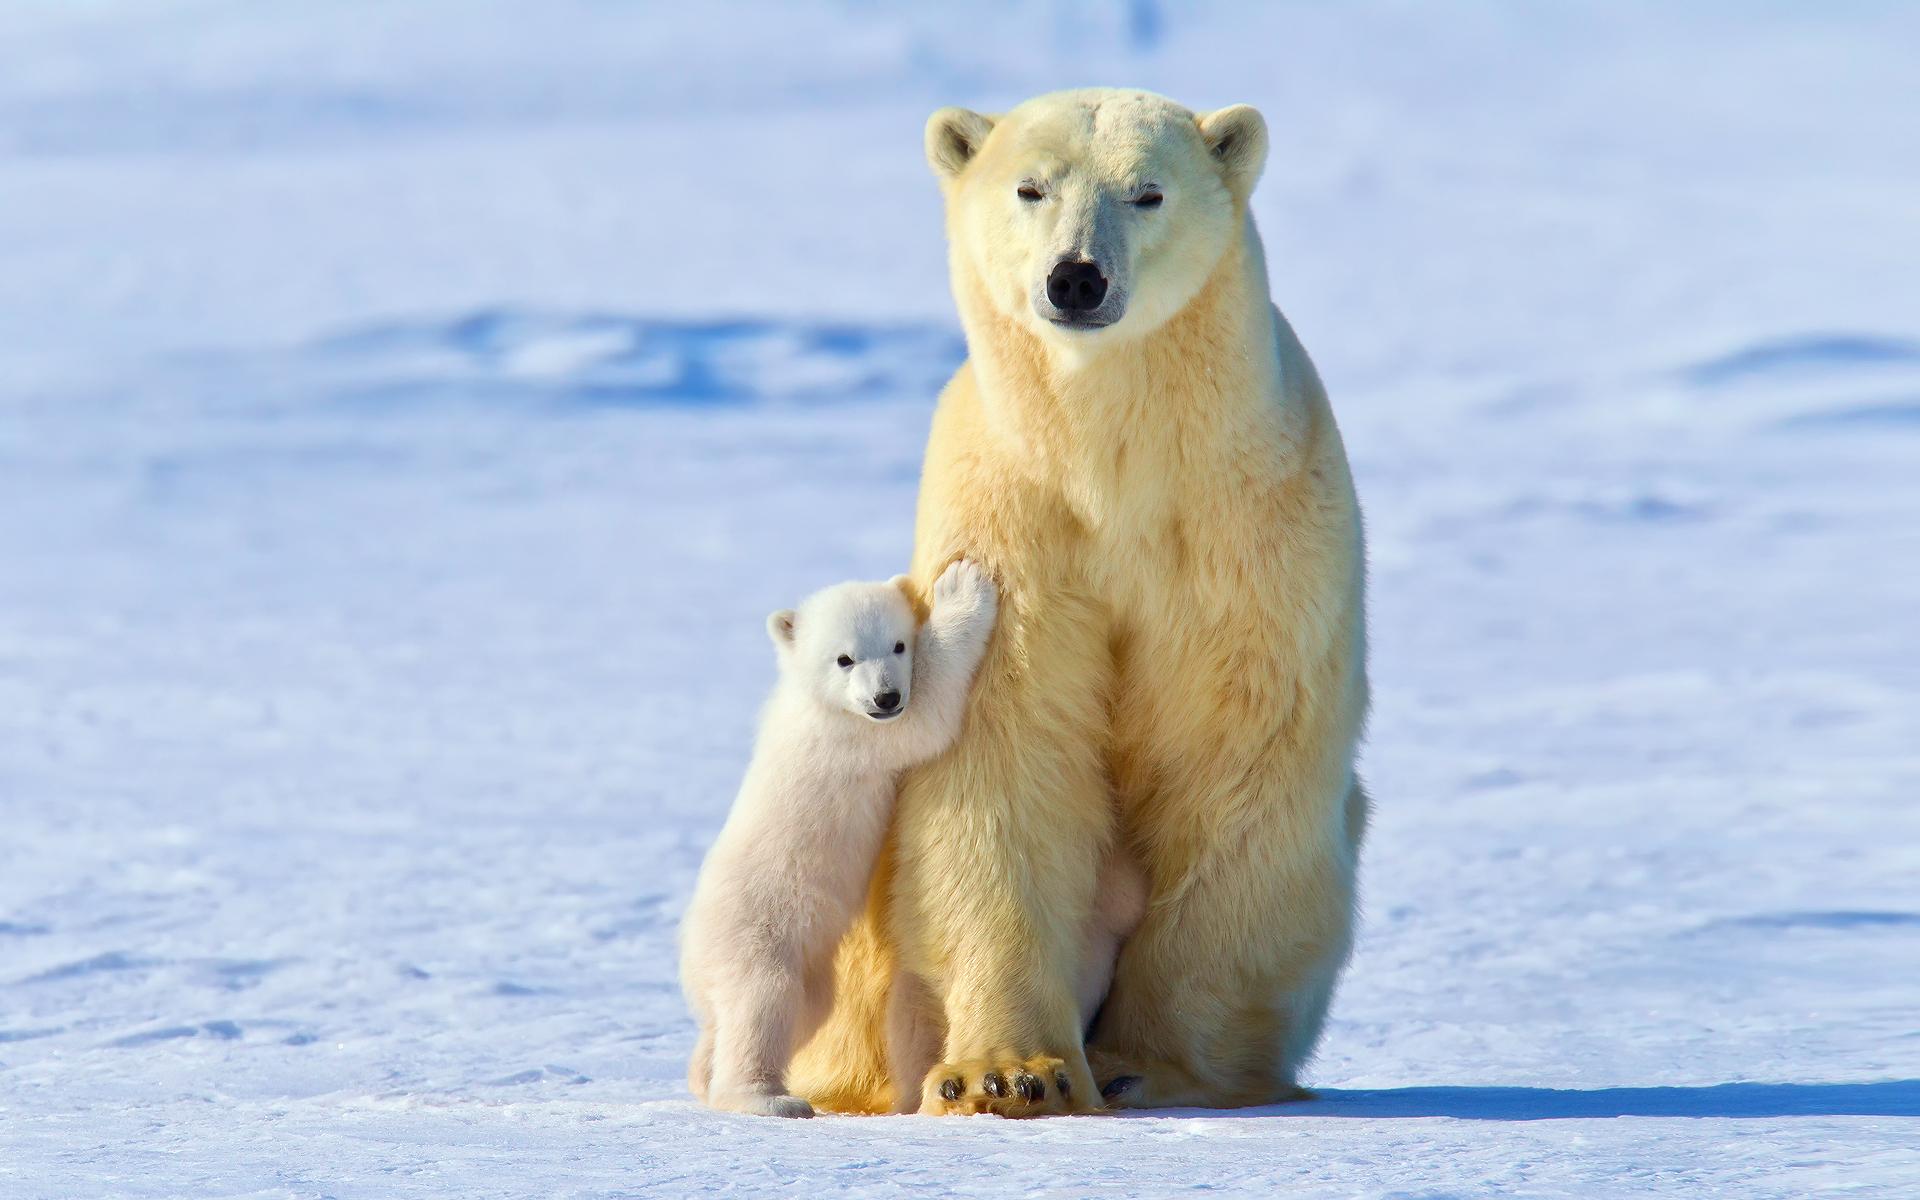 Wallpaper : snow, ice, polar bears, baby animals, Arctic ...